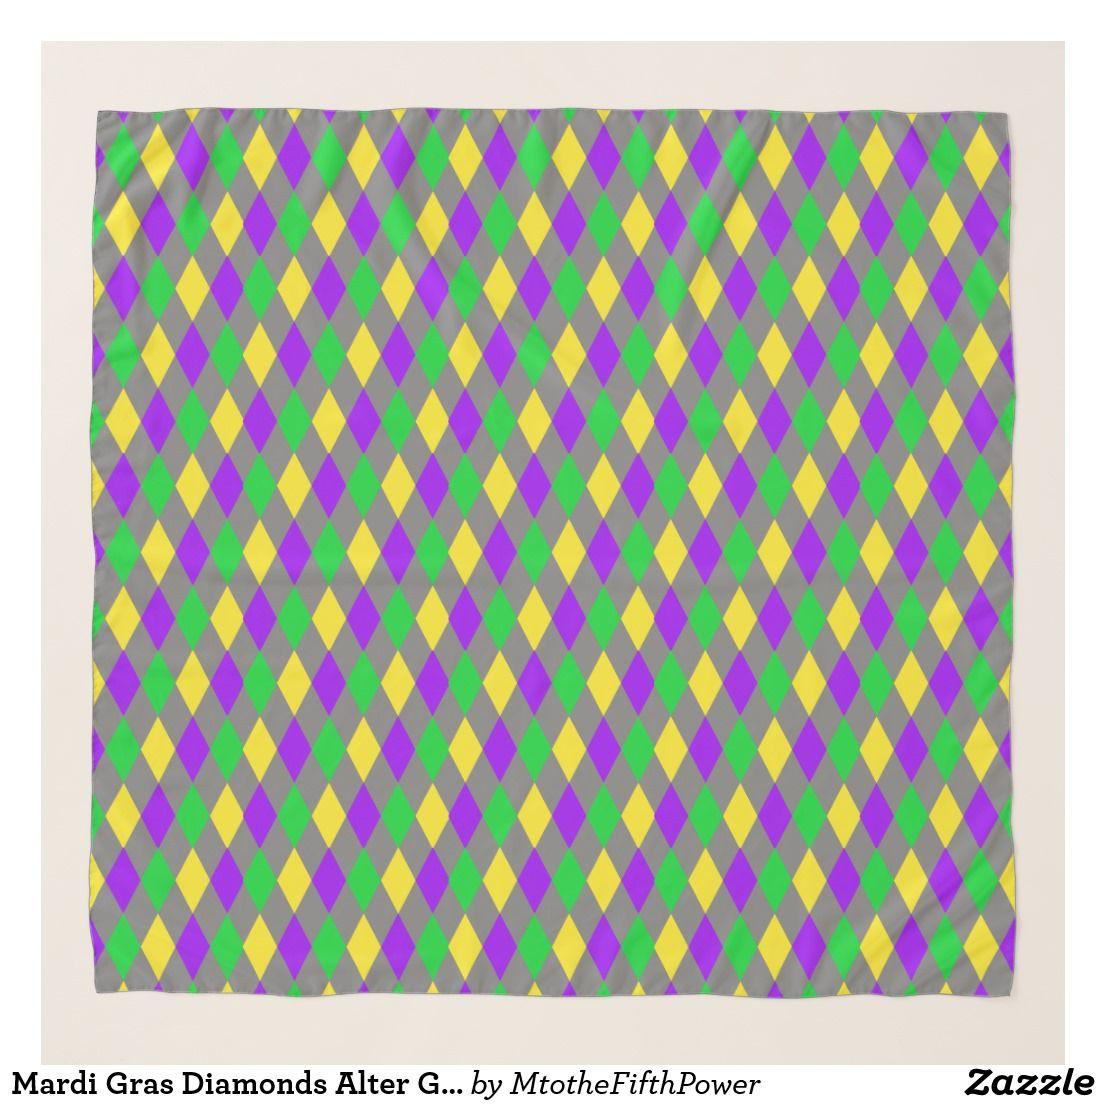 Mardi Gras Diamonds Alter Green Yellow Purple Scarf